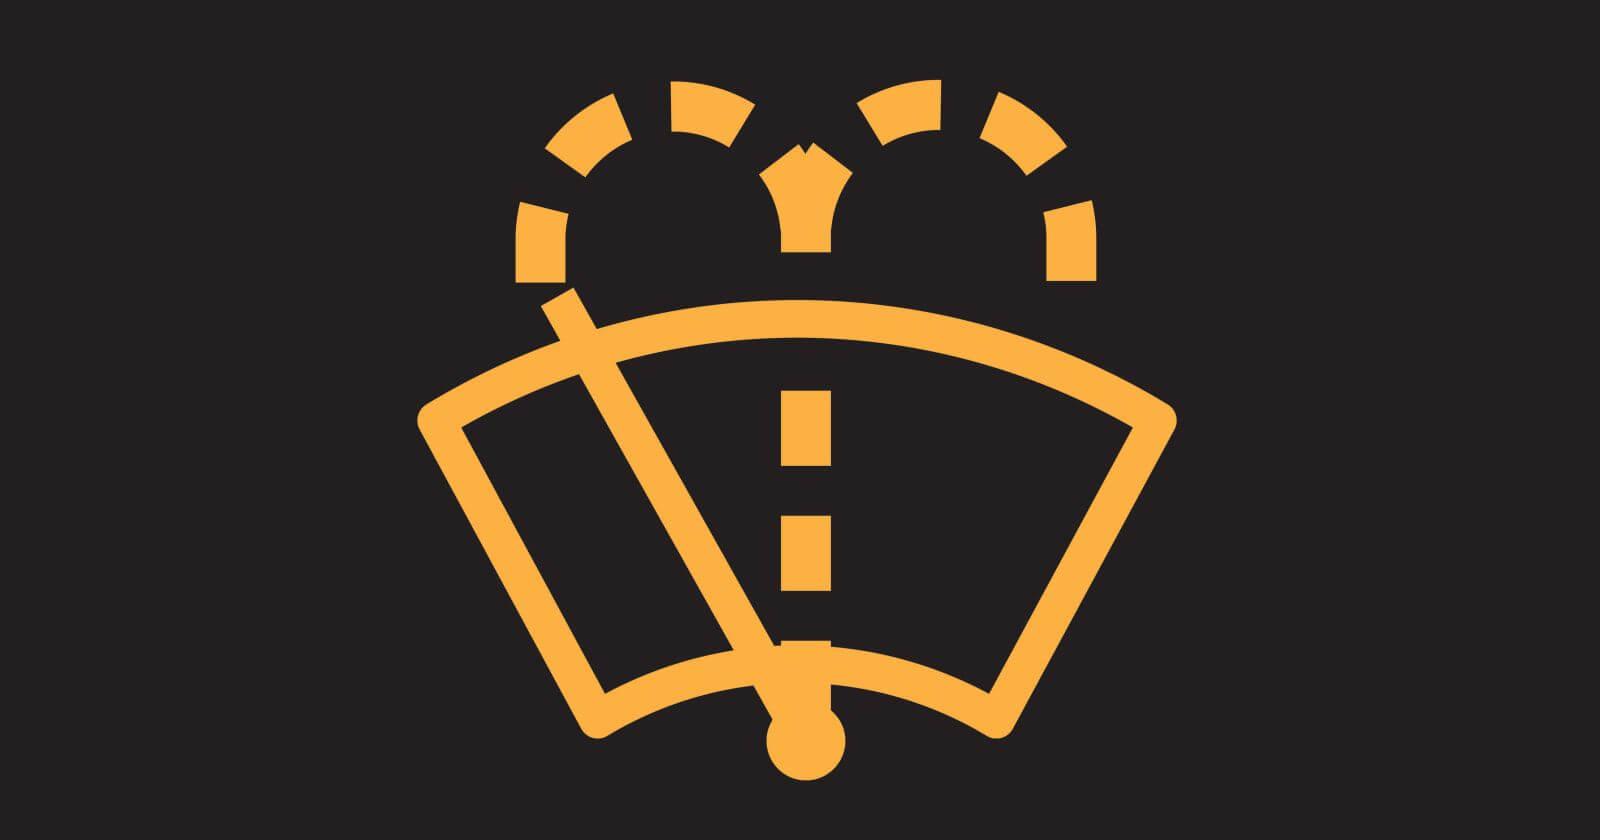 Car Dashboard Symbols - Washer Fluid Indicator